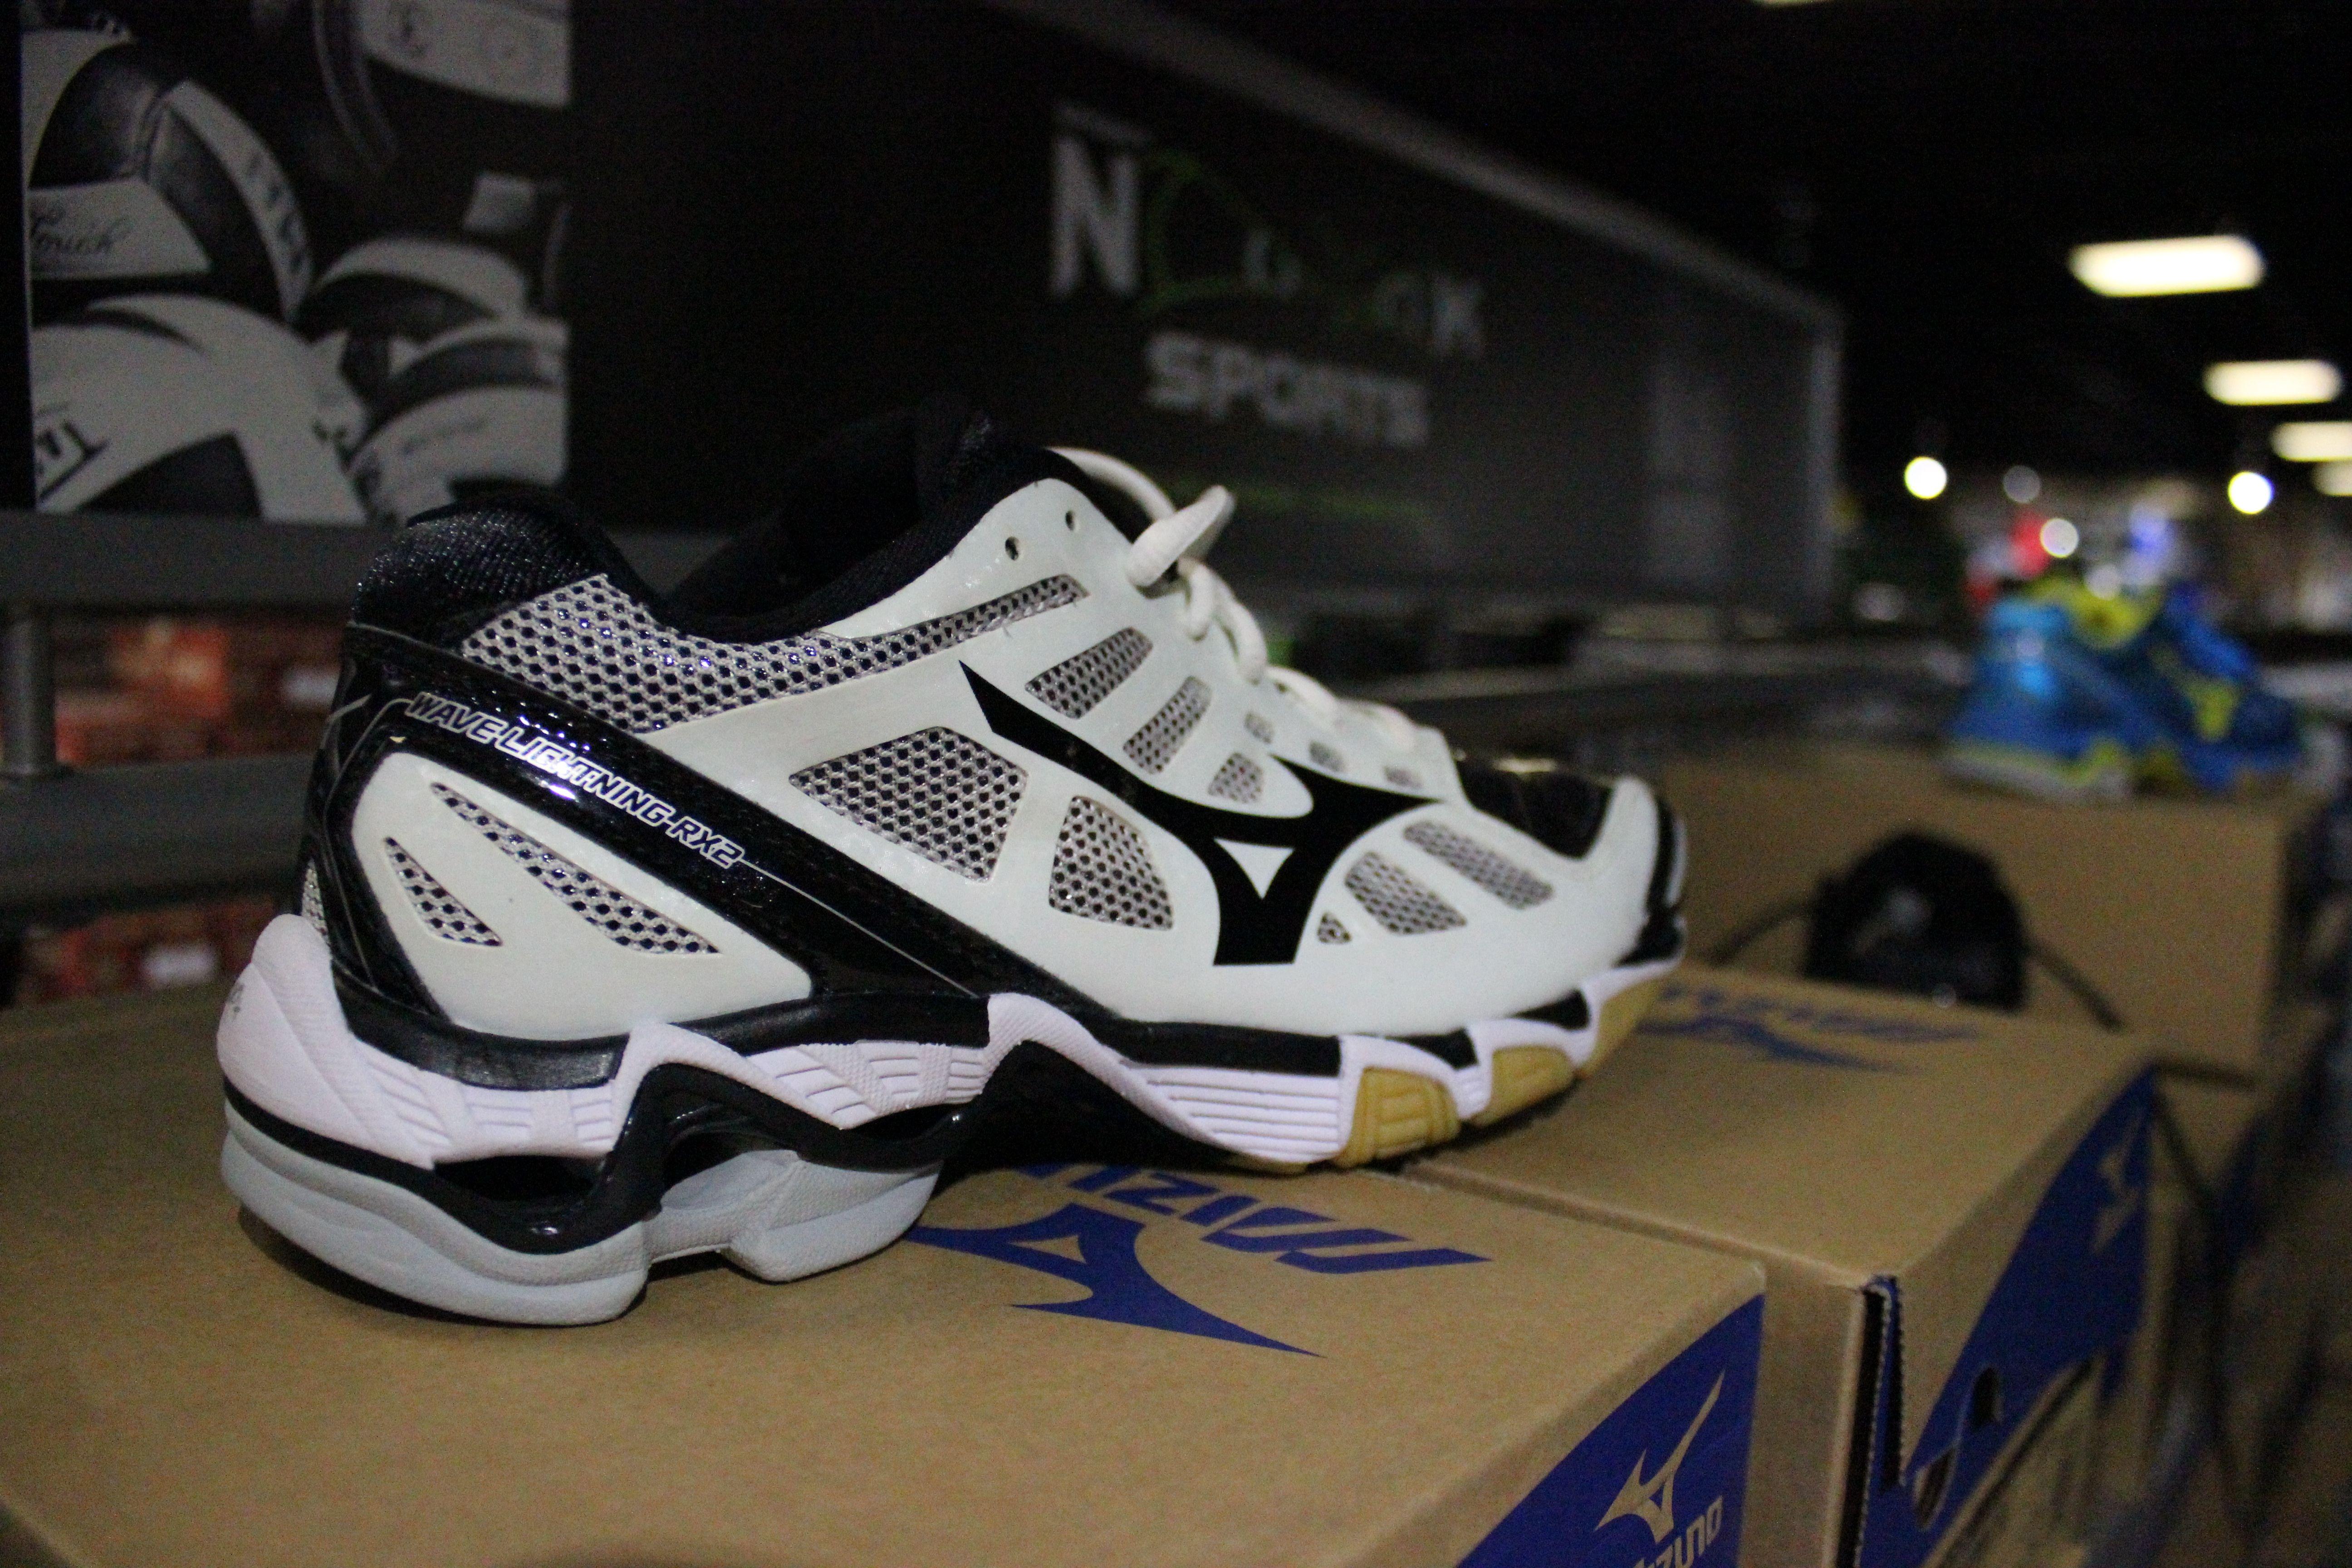 mens mizuno running shoes size 9.5 en espa�ol 80's